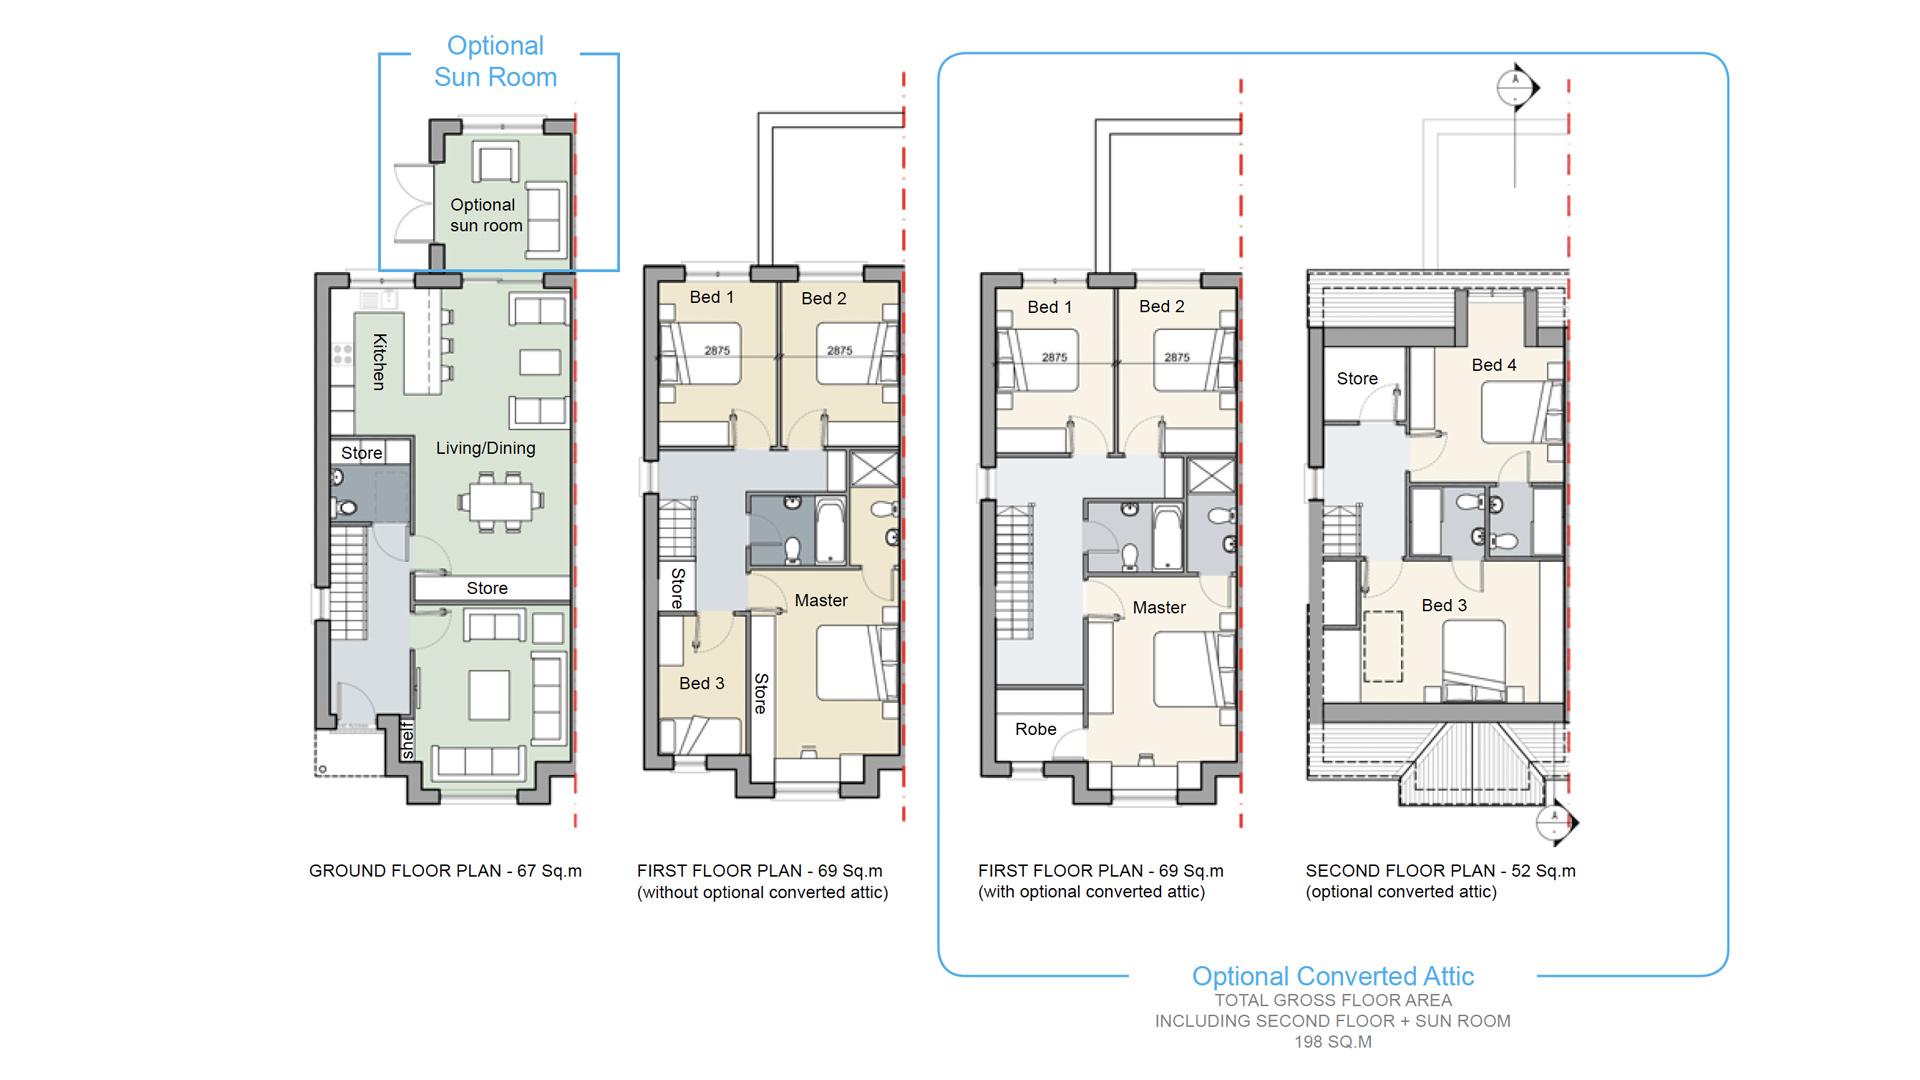 House type B3 - 4 bedroom semi-detached